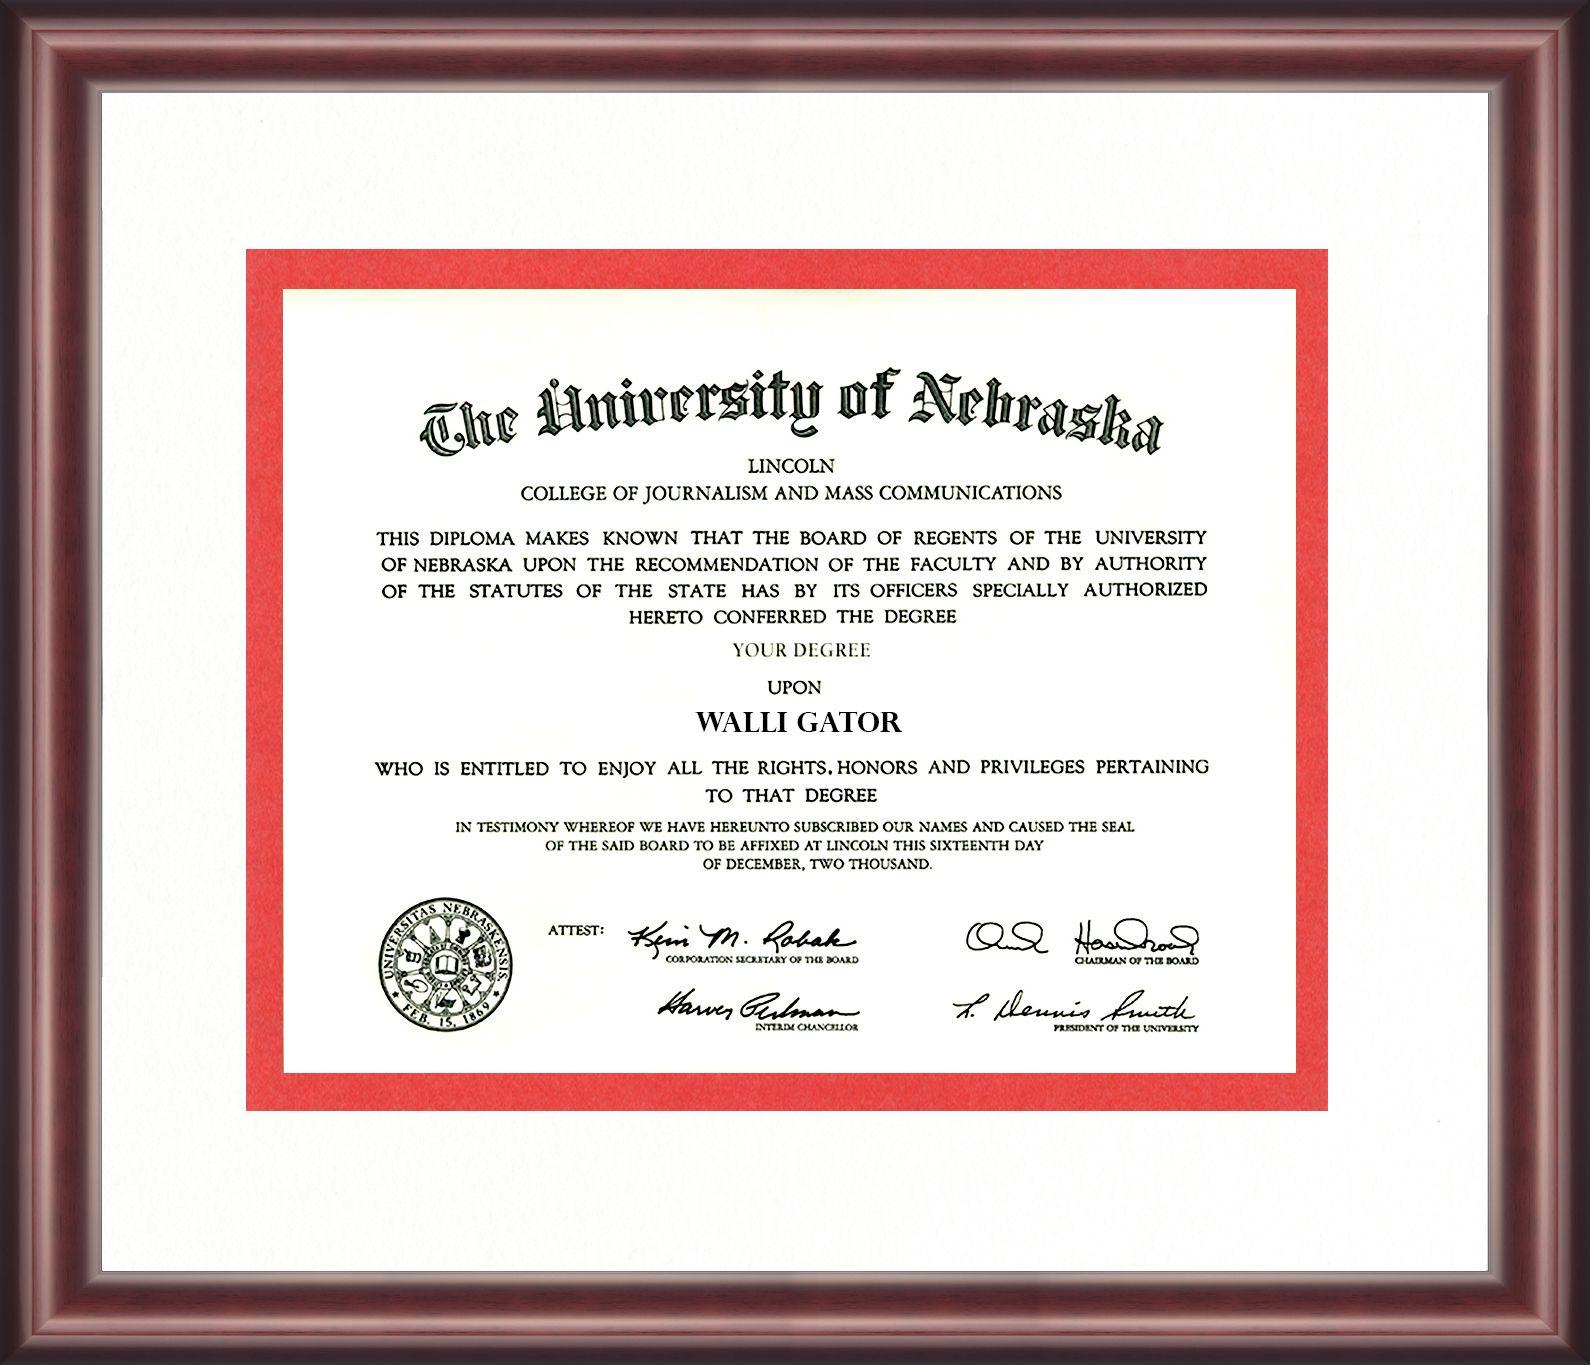 University Of Nebraska Diploma Frame Talking Walls Diploma Frame Nebraska University